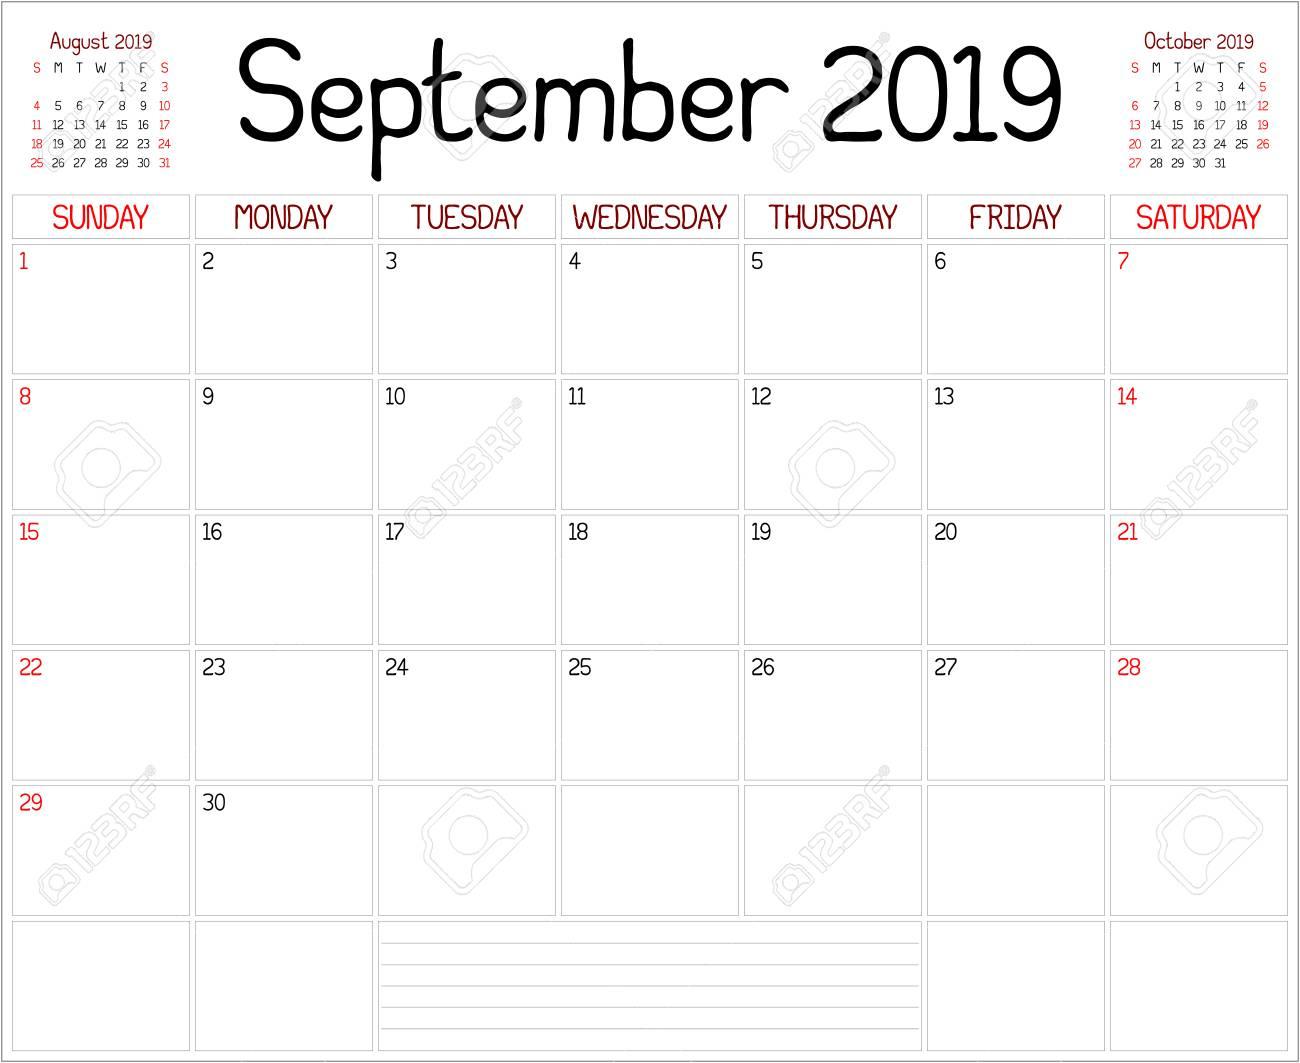 Year 2019 September Planner - A Monthly Planner Calendar For..